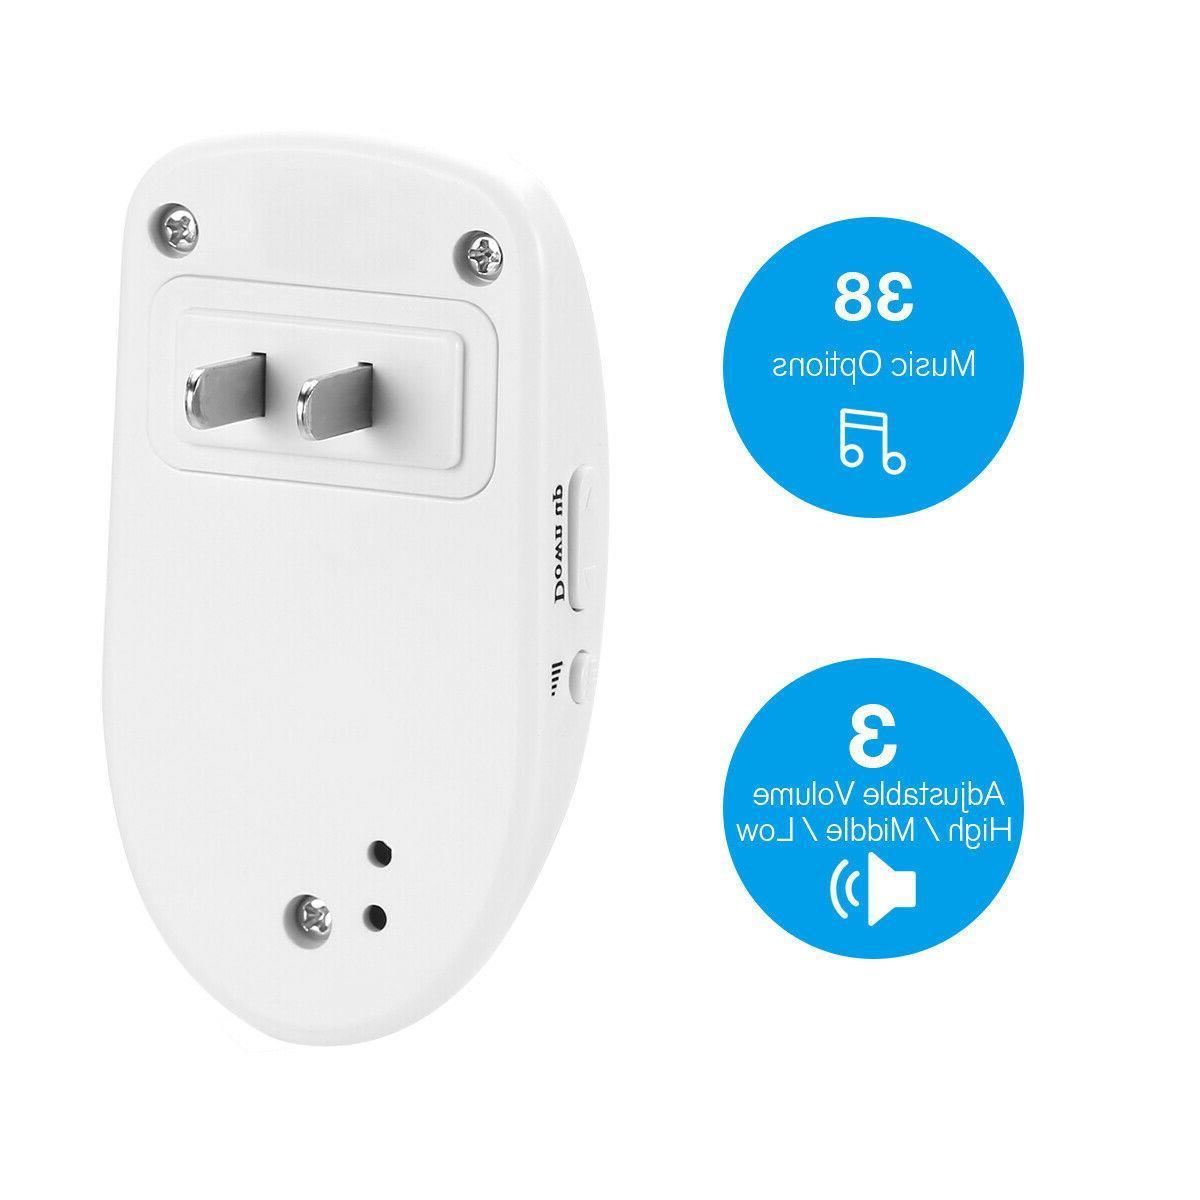 Wireless Door Loud Chime Flash 1Transmitter+2 in